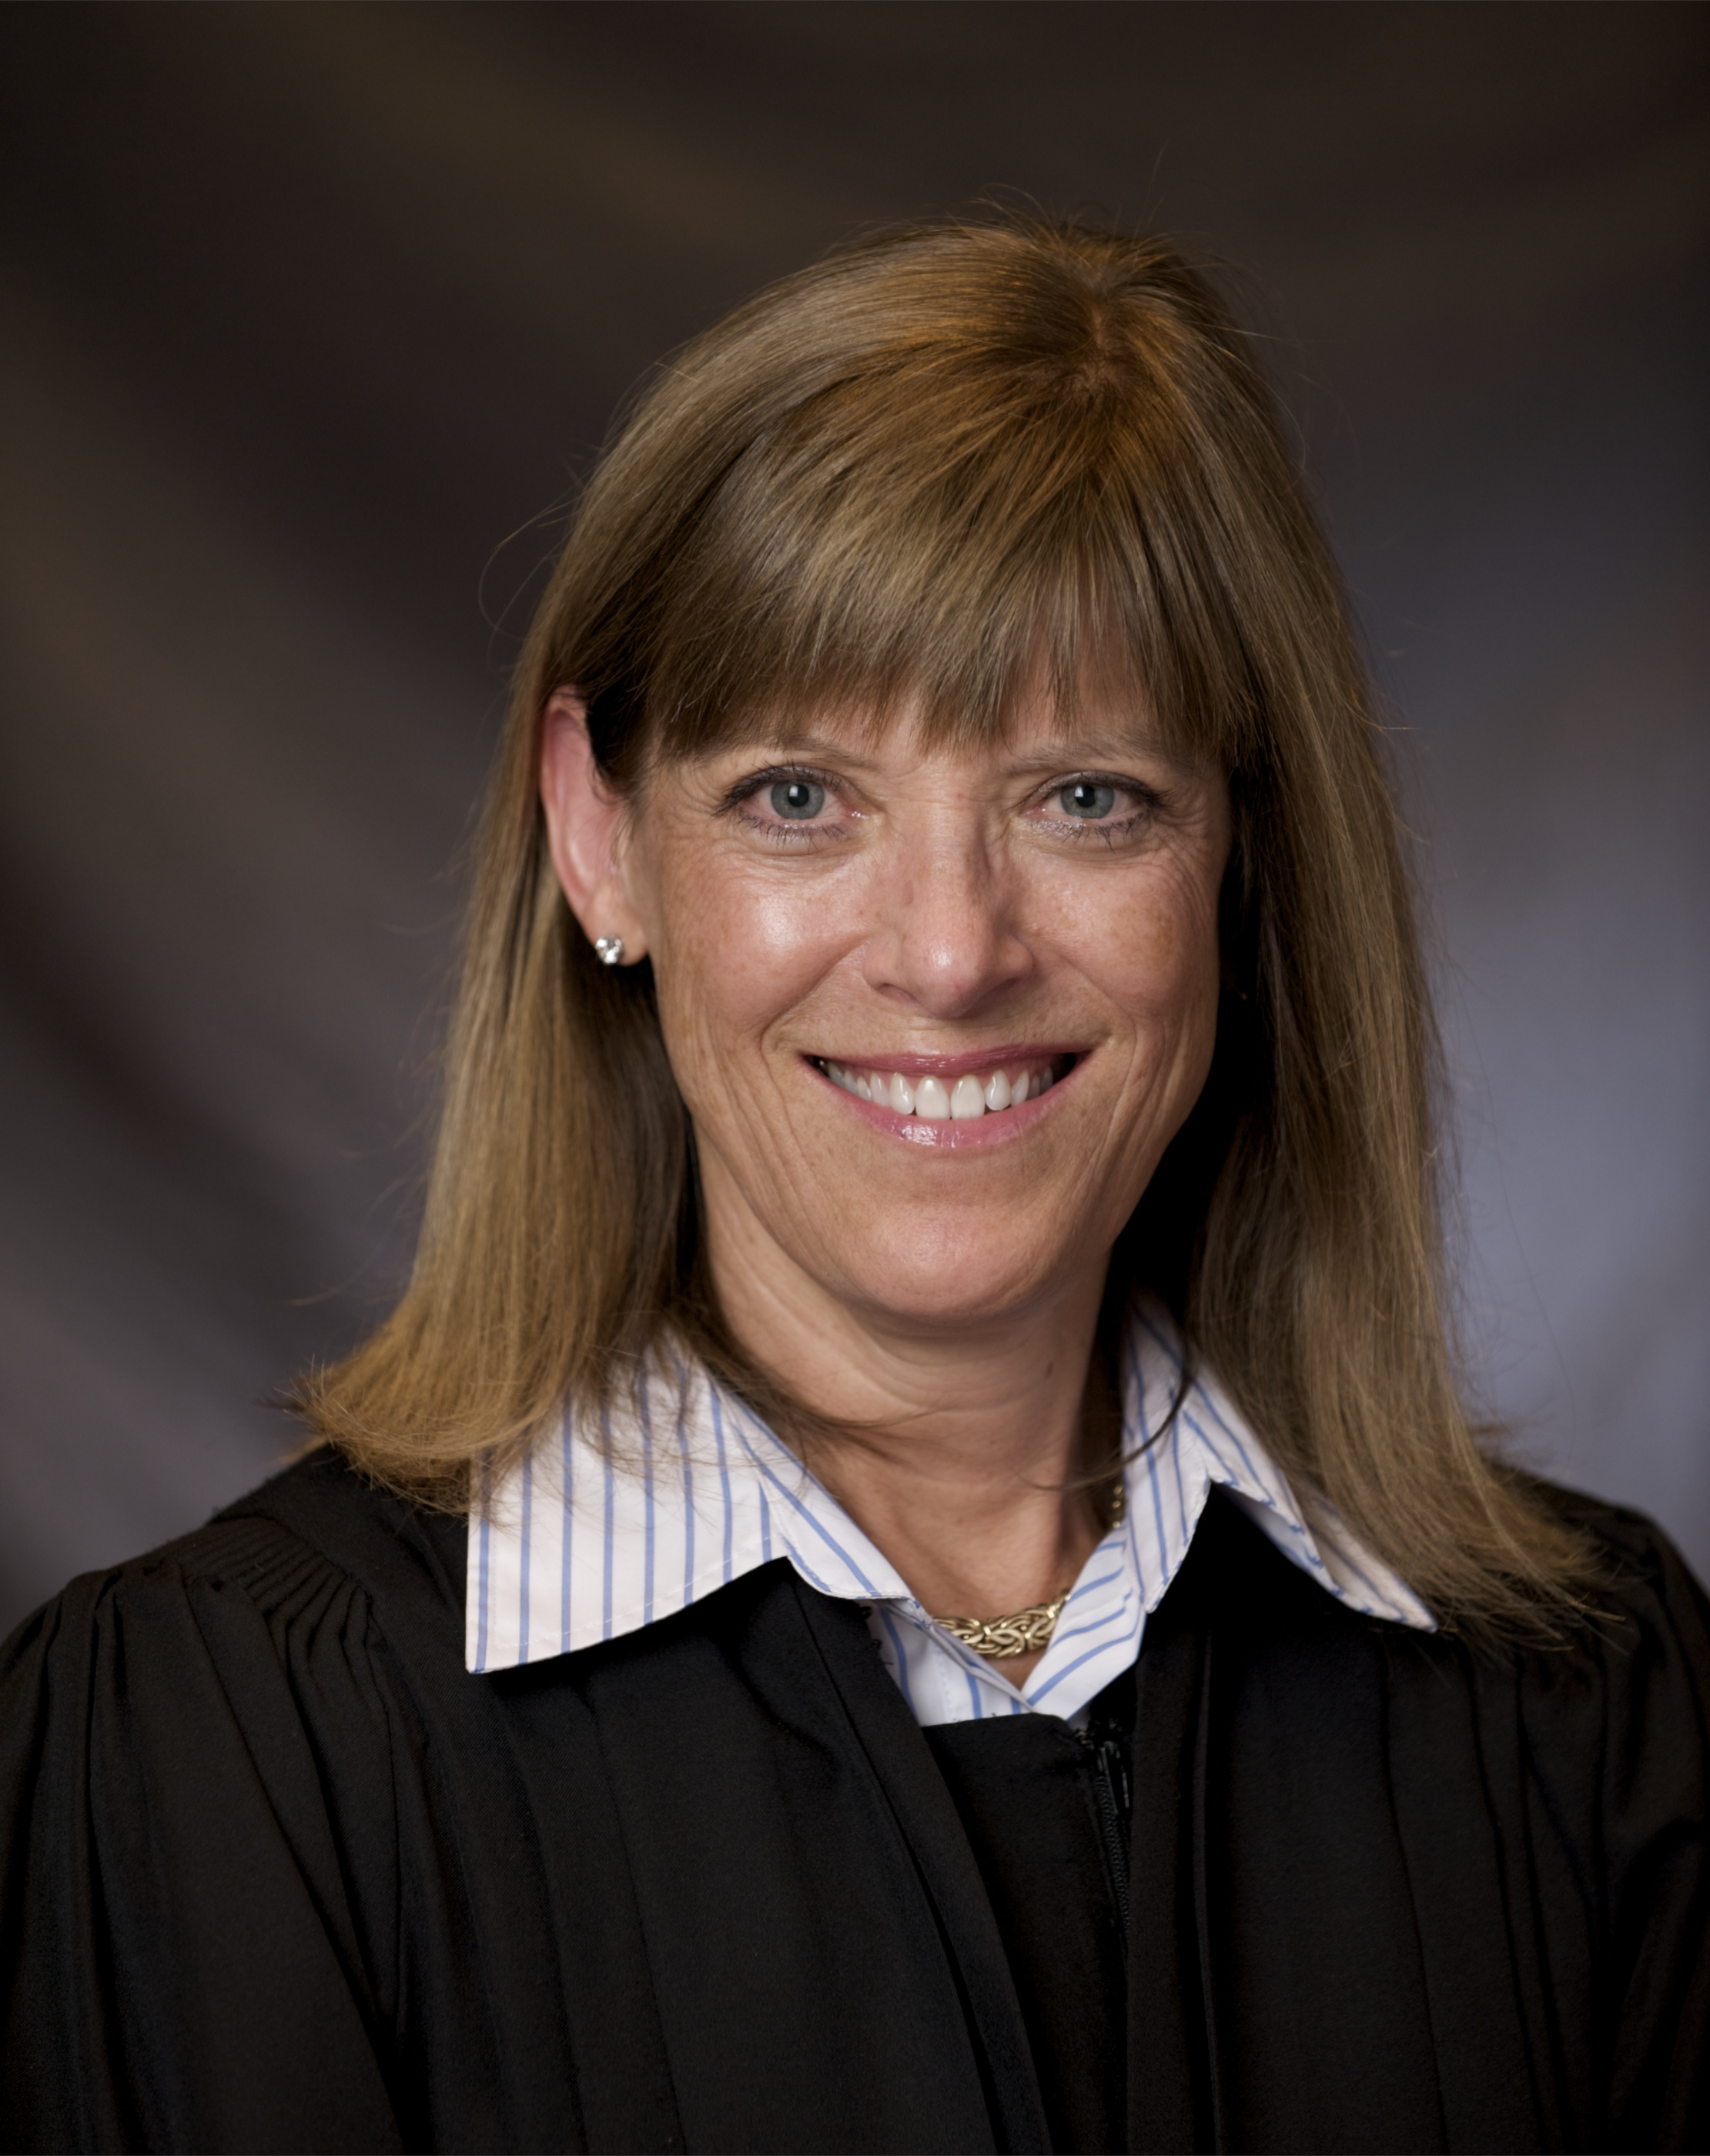 Portrait of Judge Halbrooks